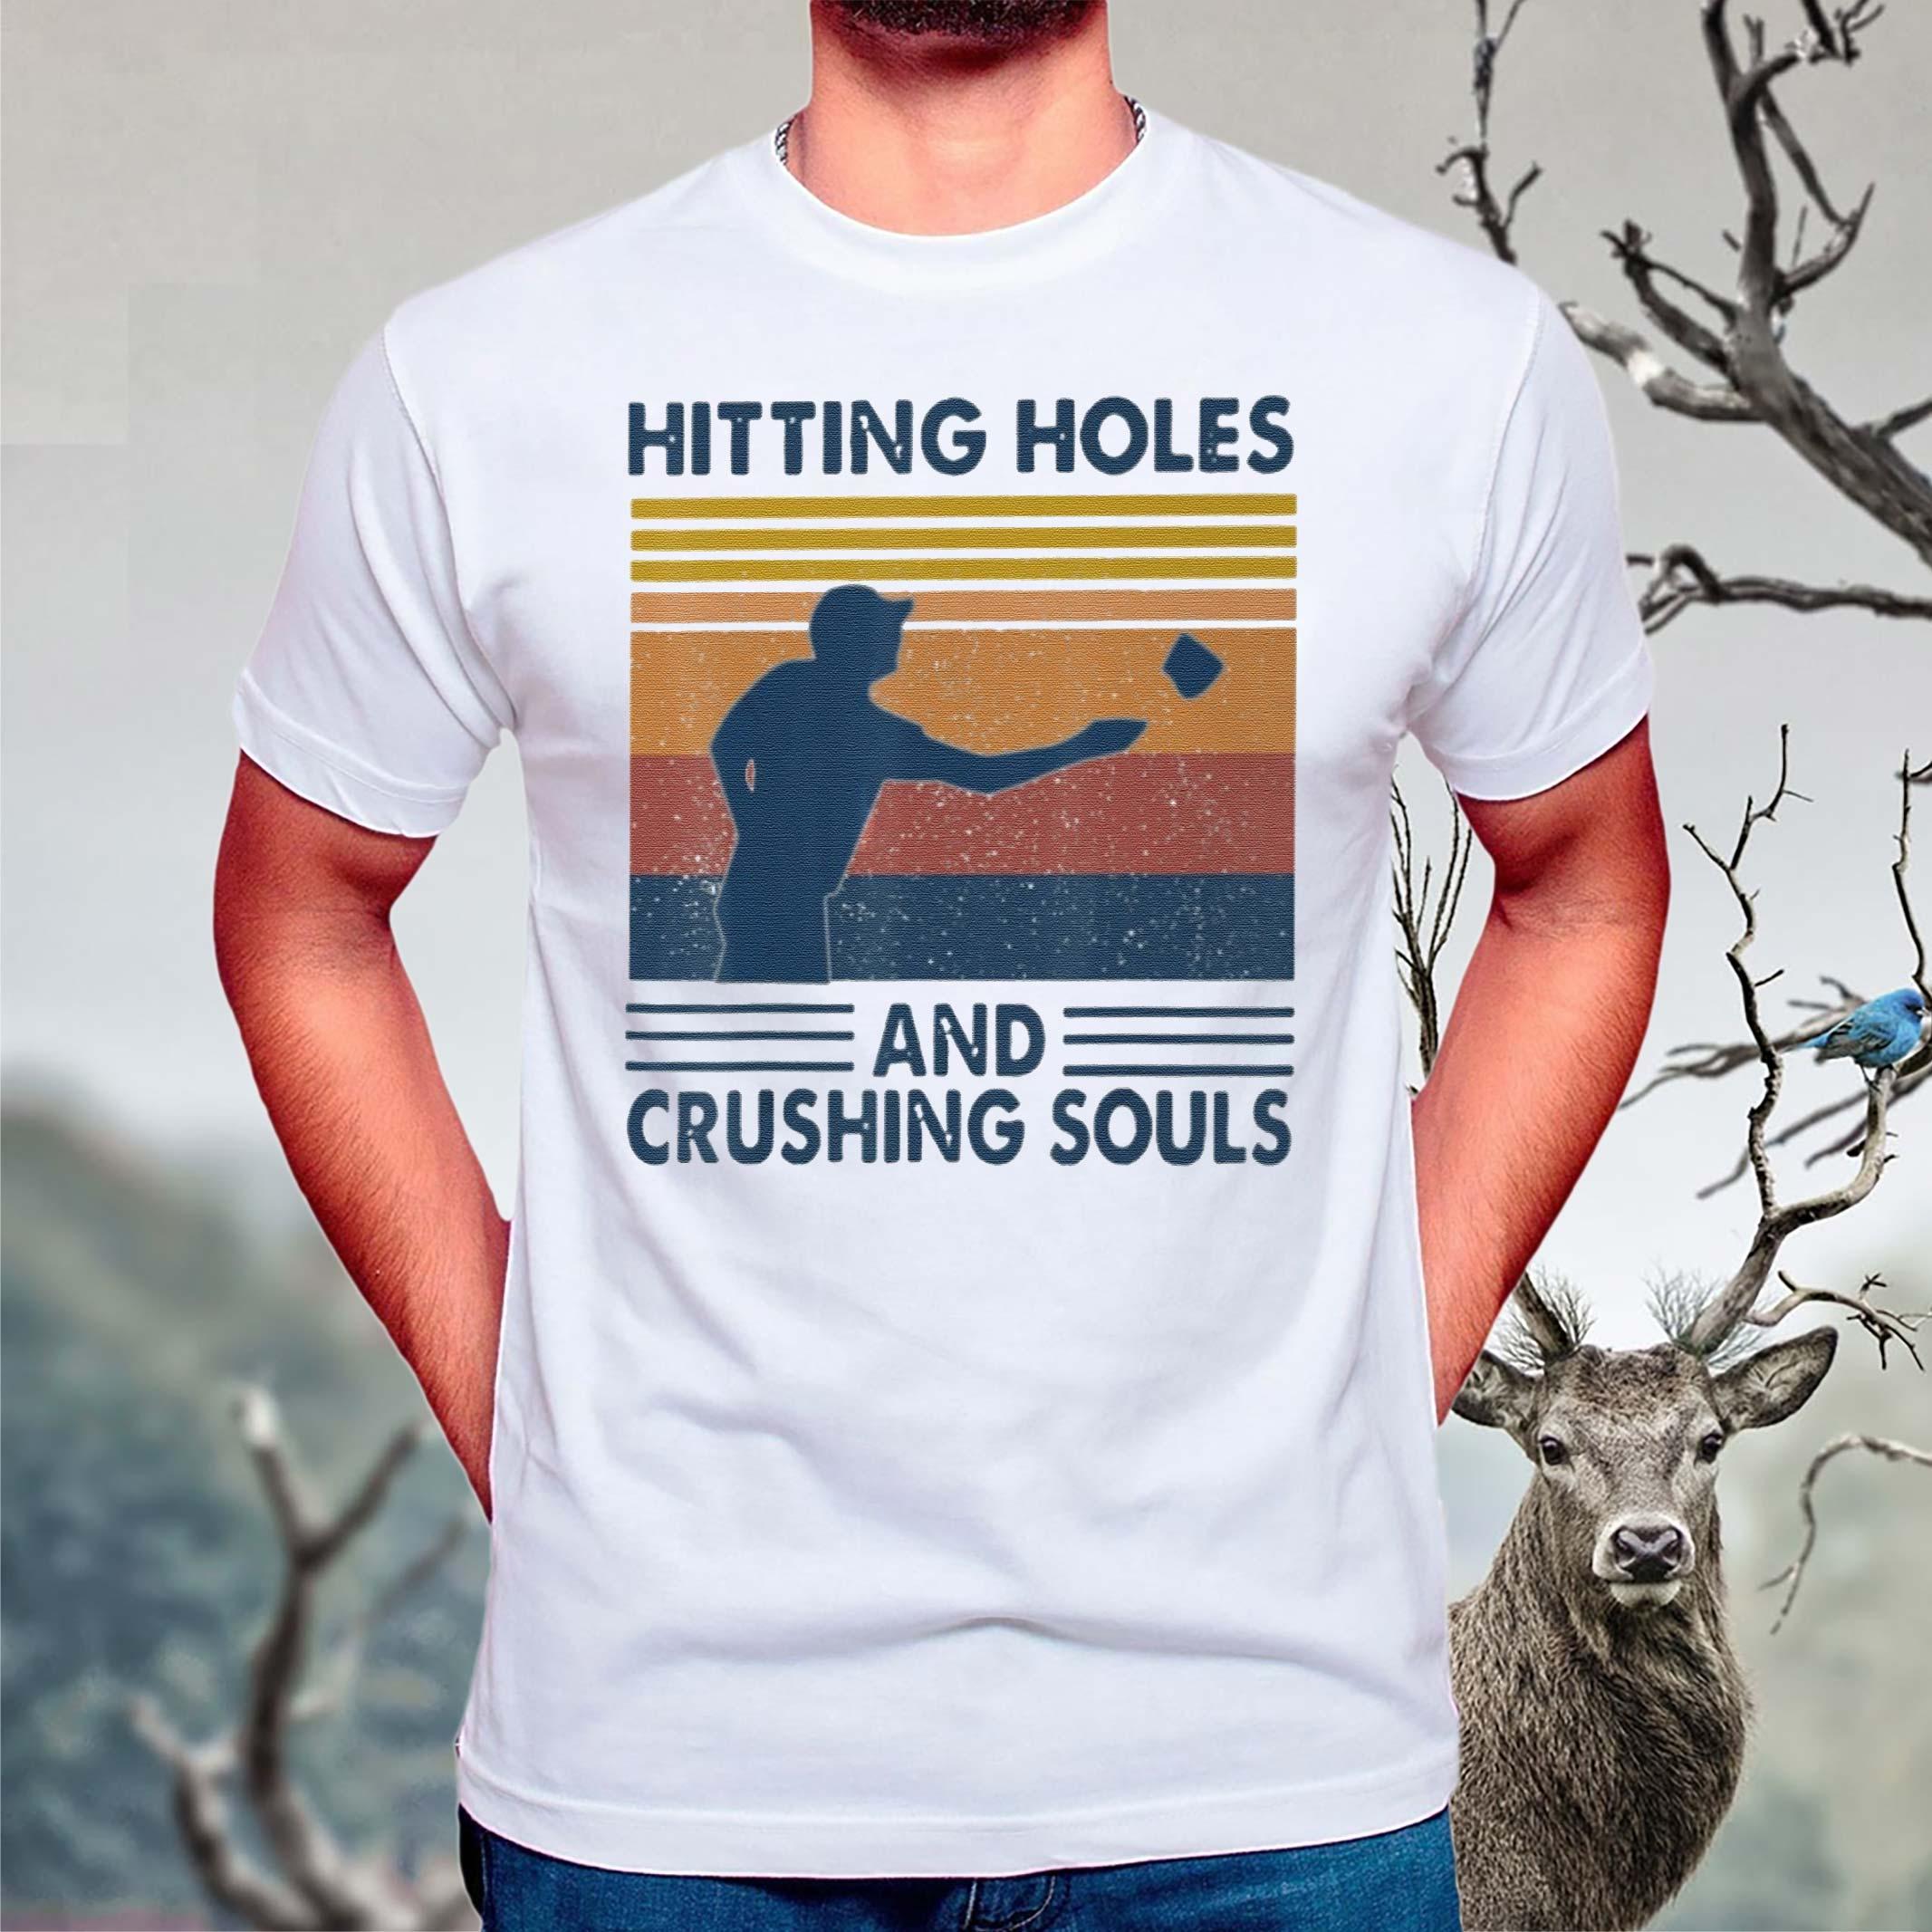 Hitting-Holes-Crushing-Souls-T-Shirts